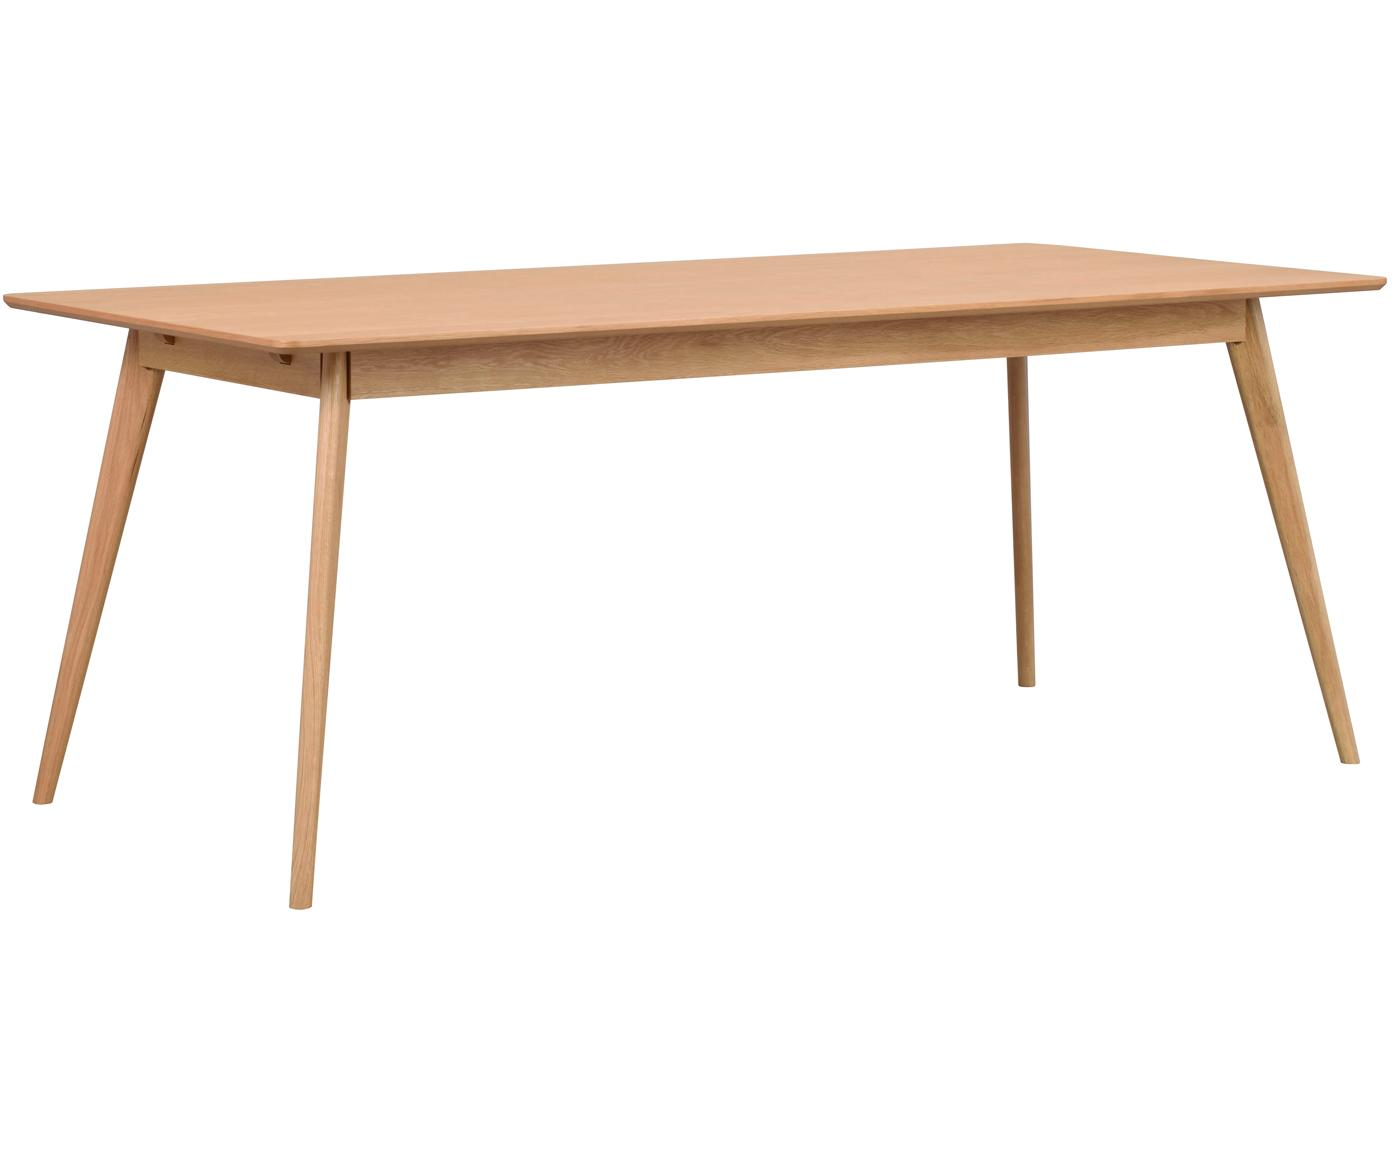 Mesa de comedor Yumi, Tablero: tablero de fibras de dens, Patas: madera de caucho maciza c, Roble, An 190 x F 90 cm